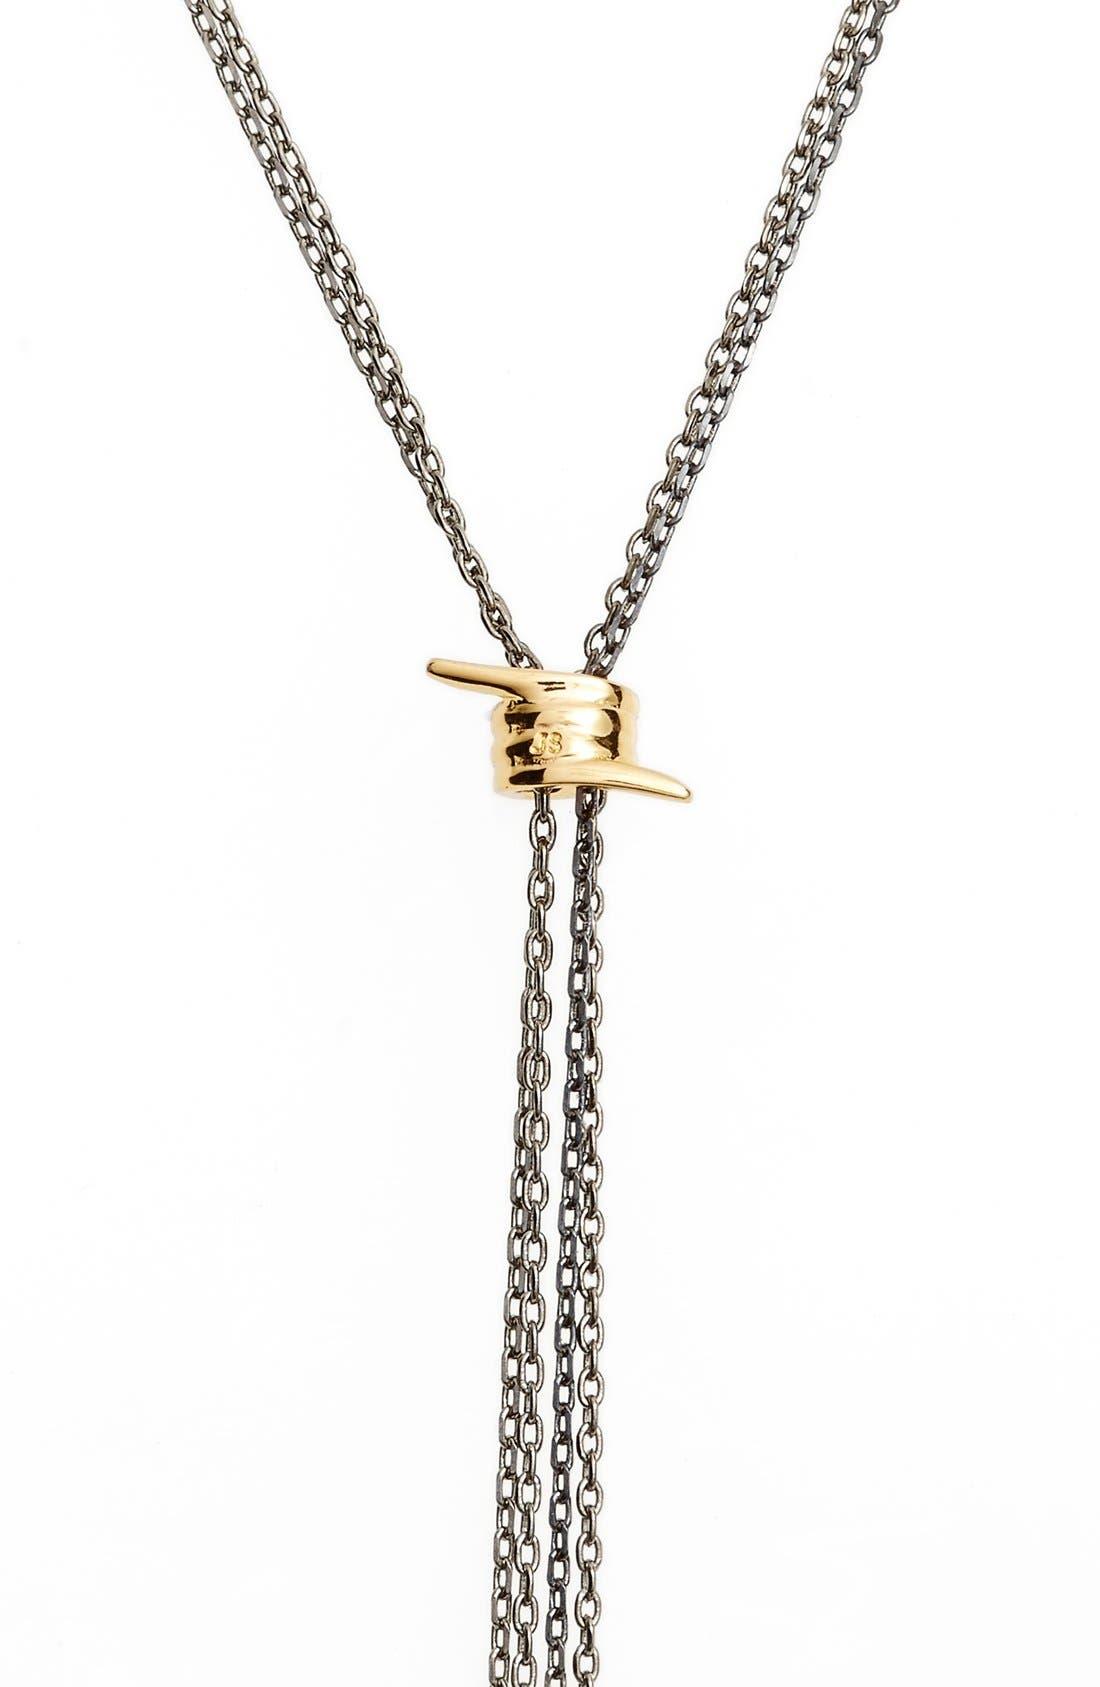 Topanga Lariat Necklace,                             Alternate thumbnail 2, color,                             Gunmetal/ Gold